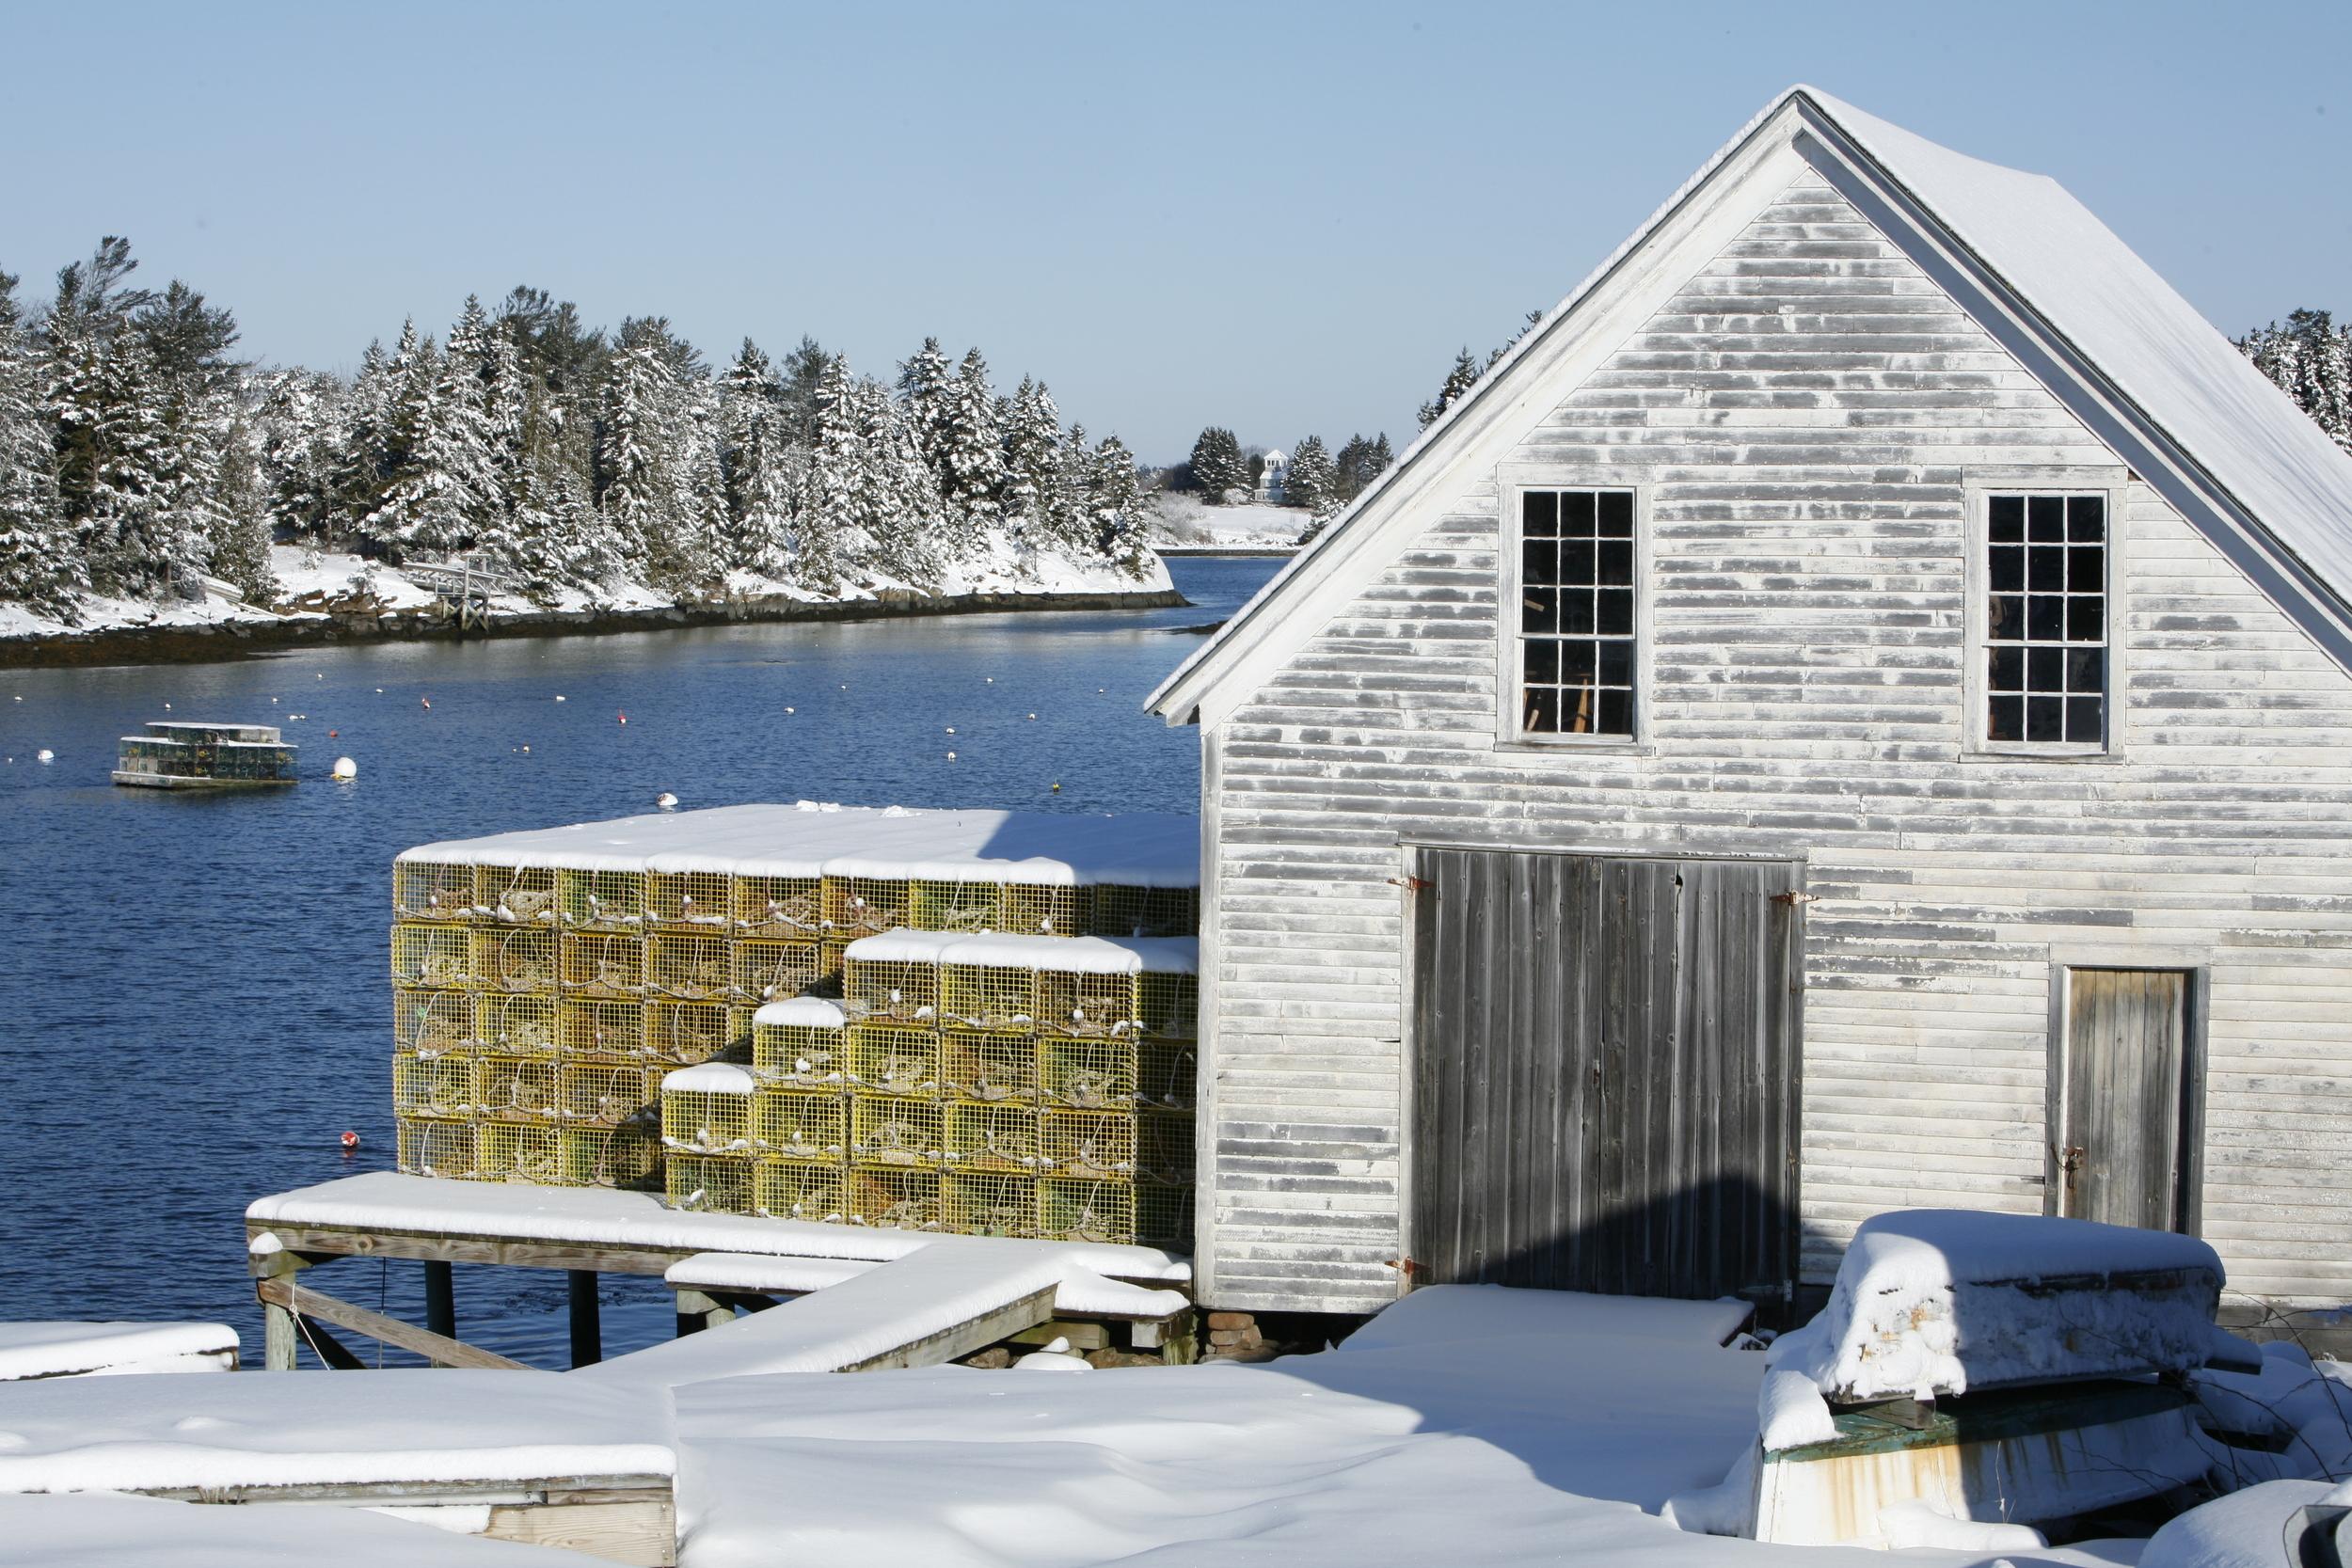 December: Cozy Harbor, Southport